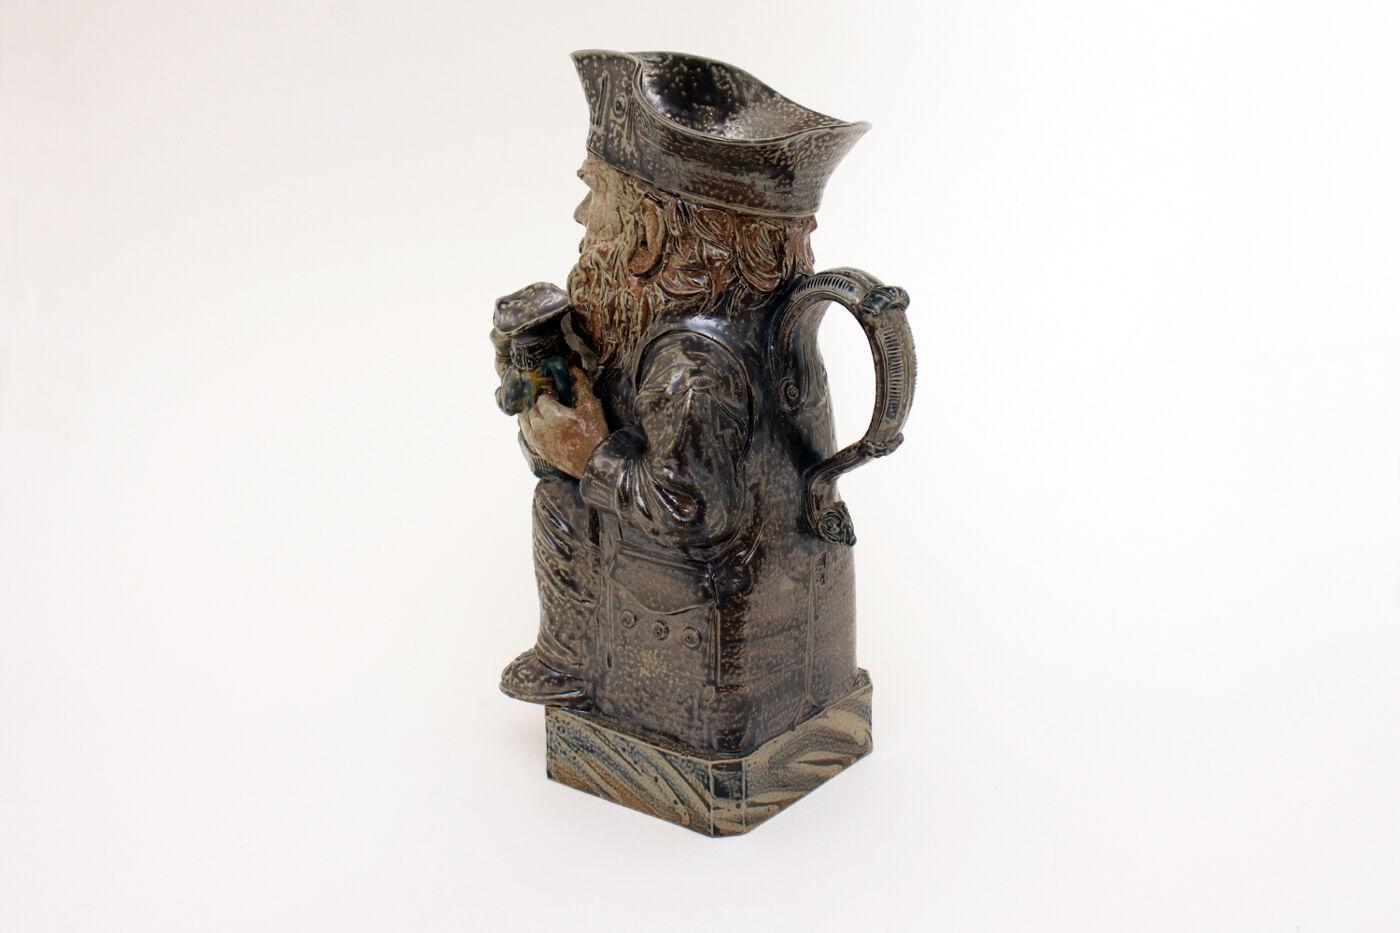 Peter Meanley Ceramic Toby Jug